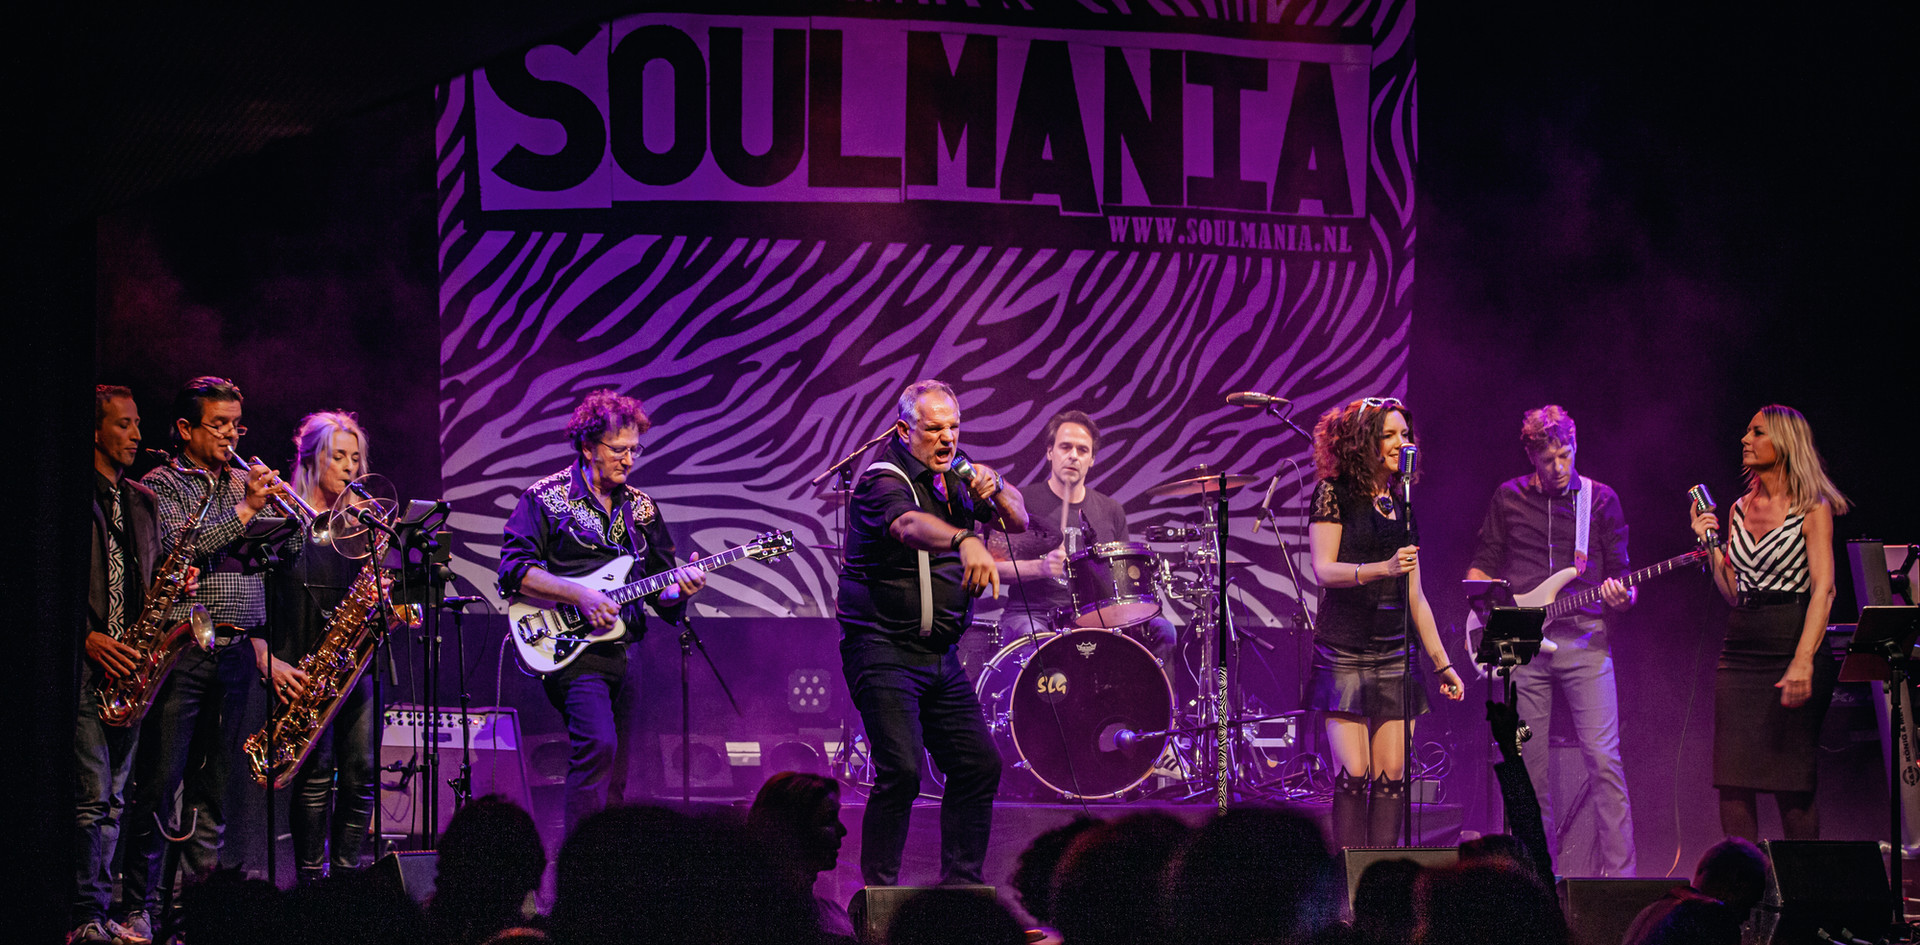 Soulmania_20191130_CF_Josanne_van_der_He